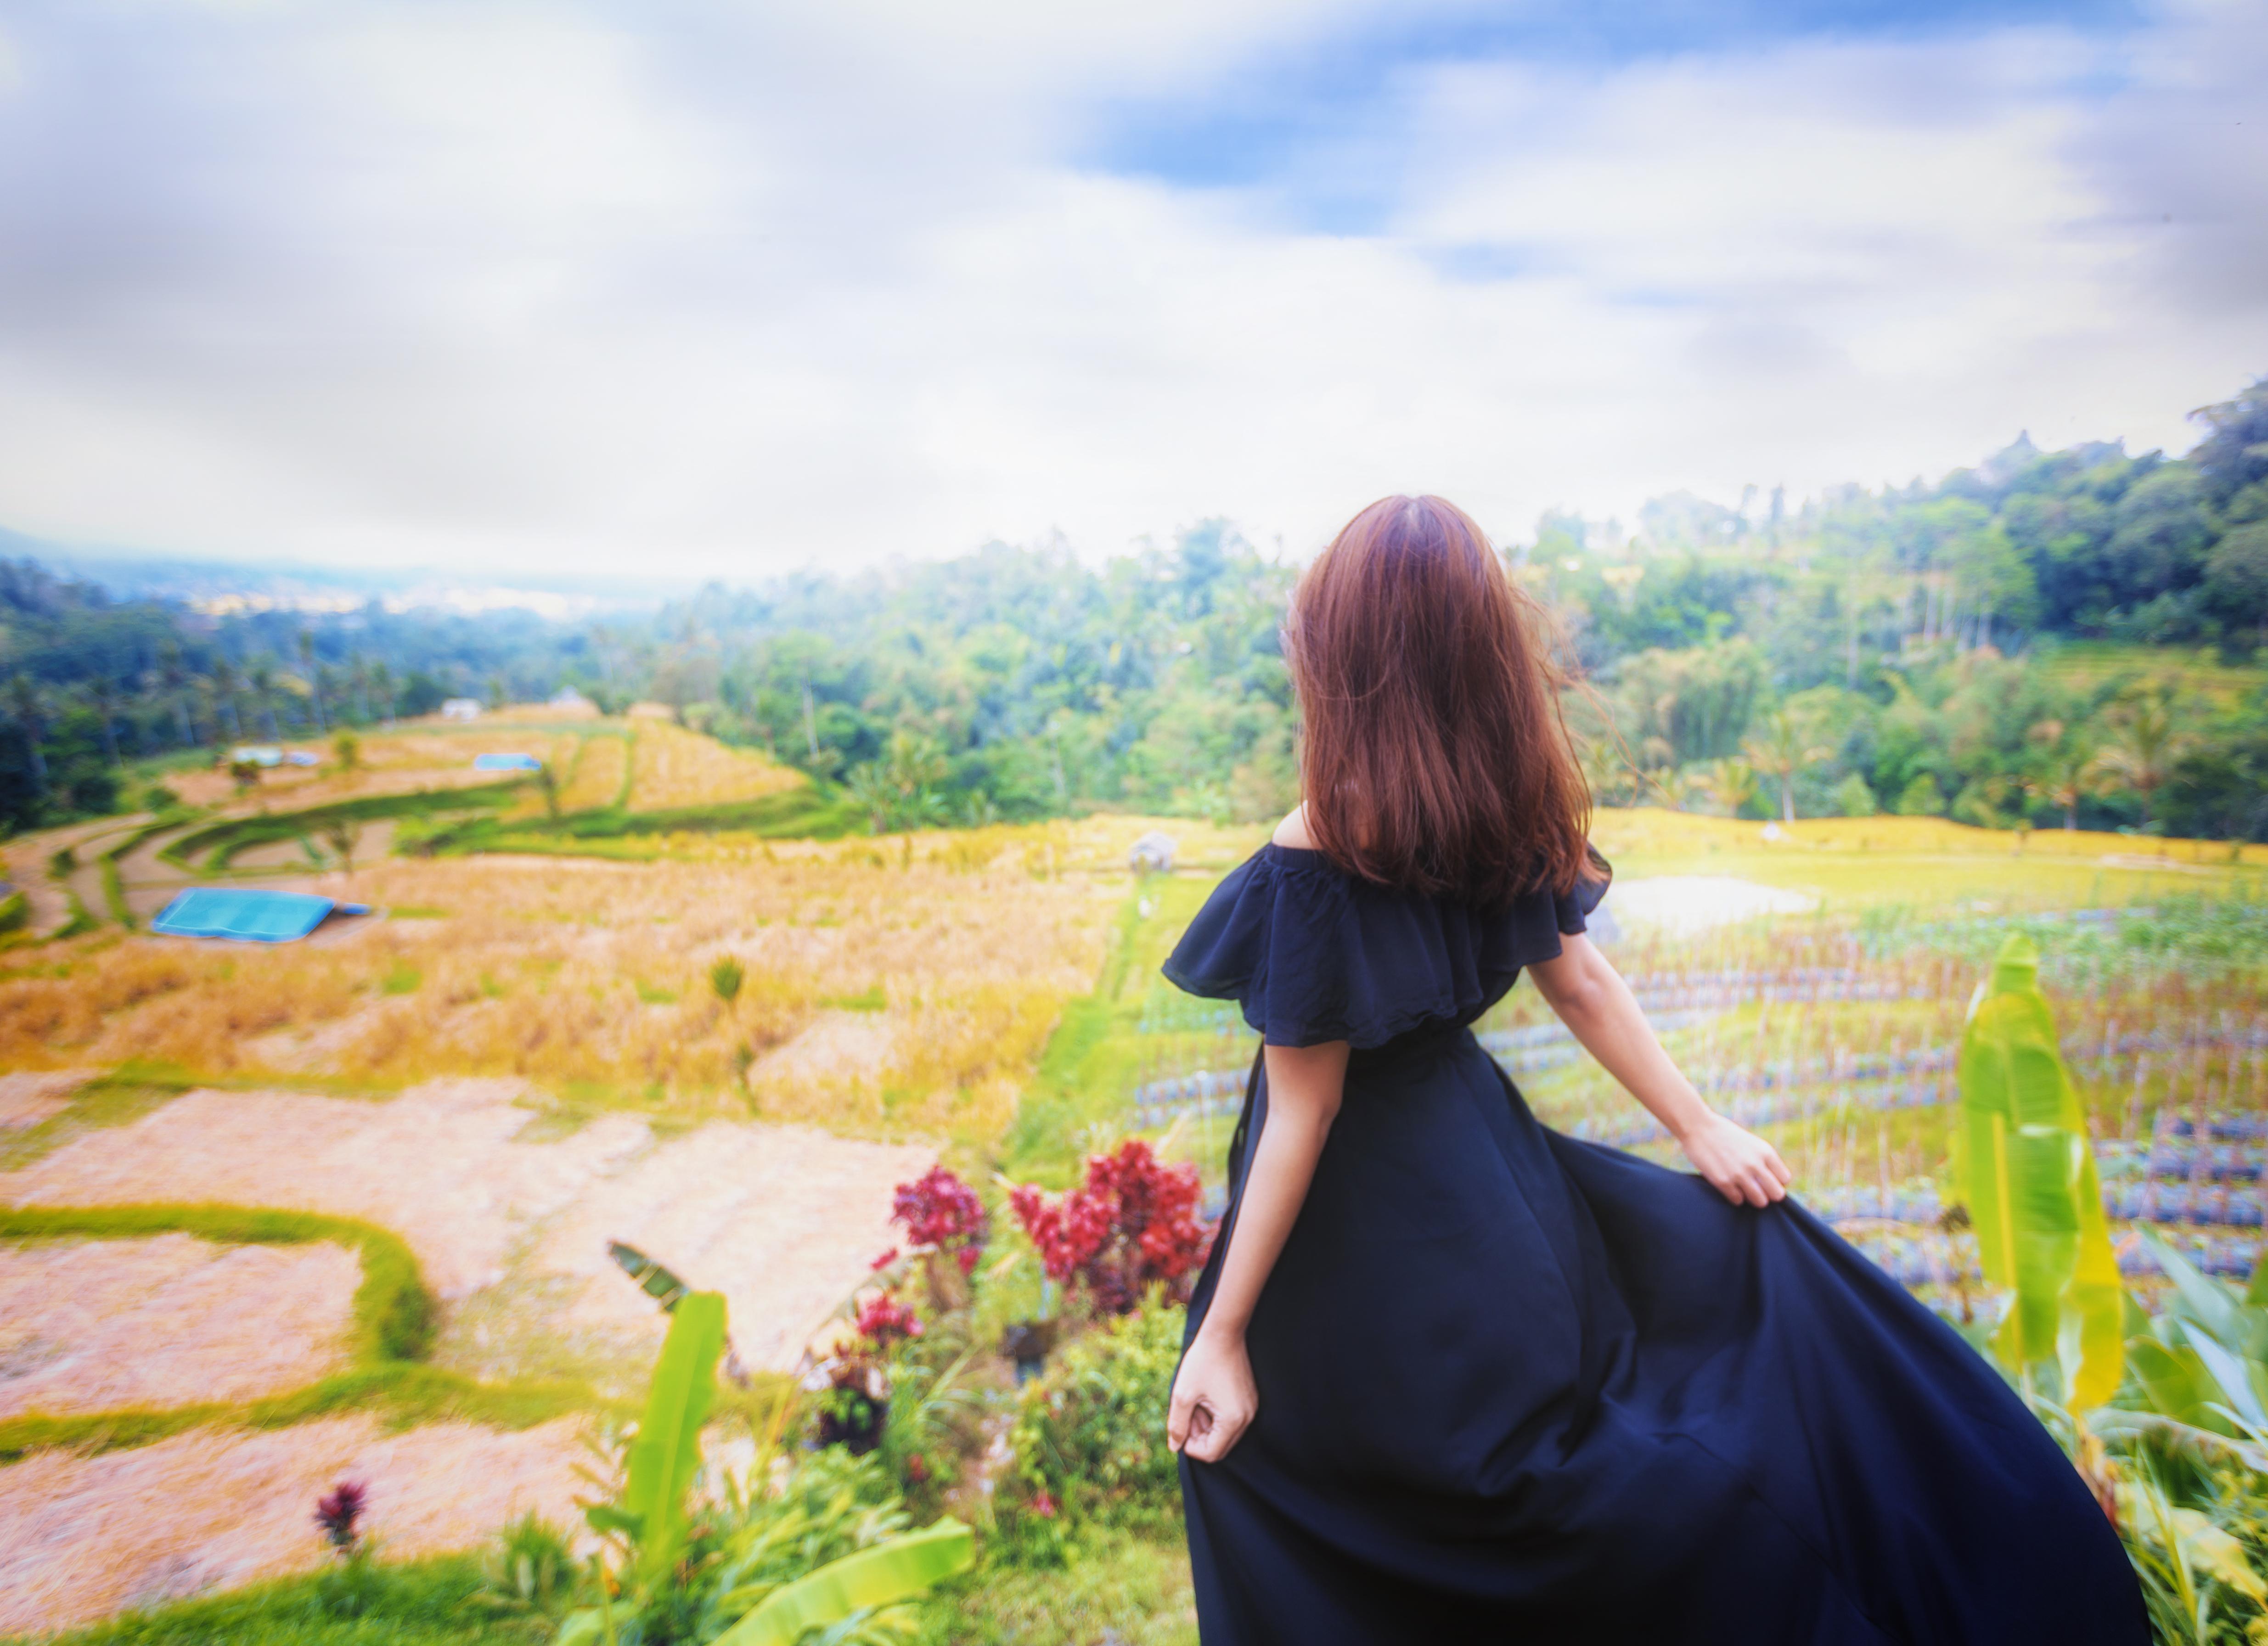 Desa Atas Awan